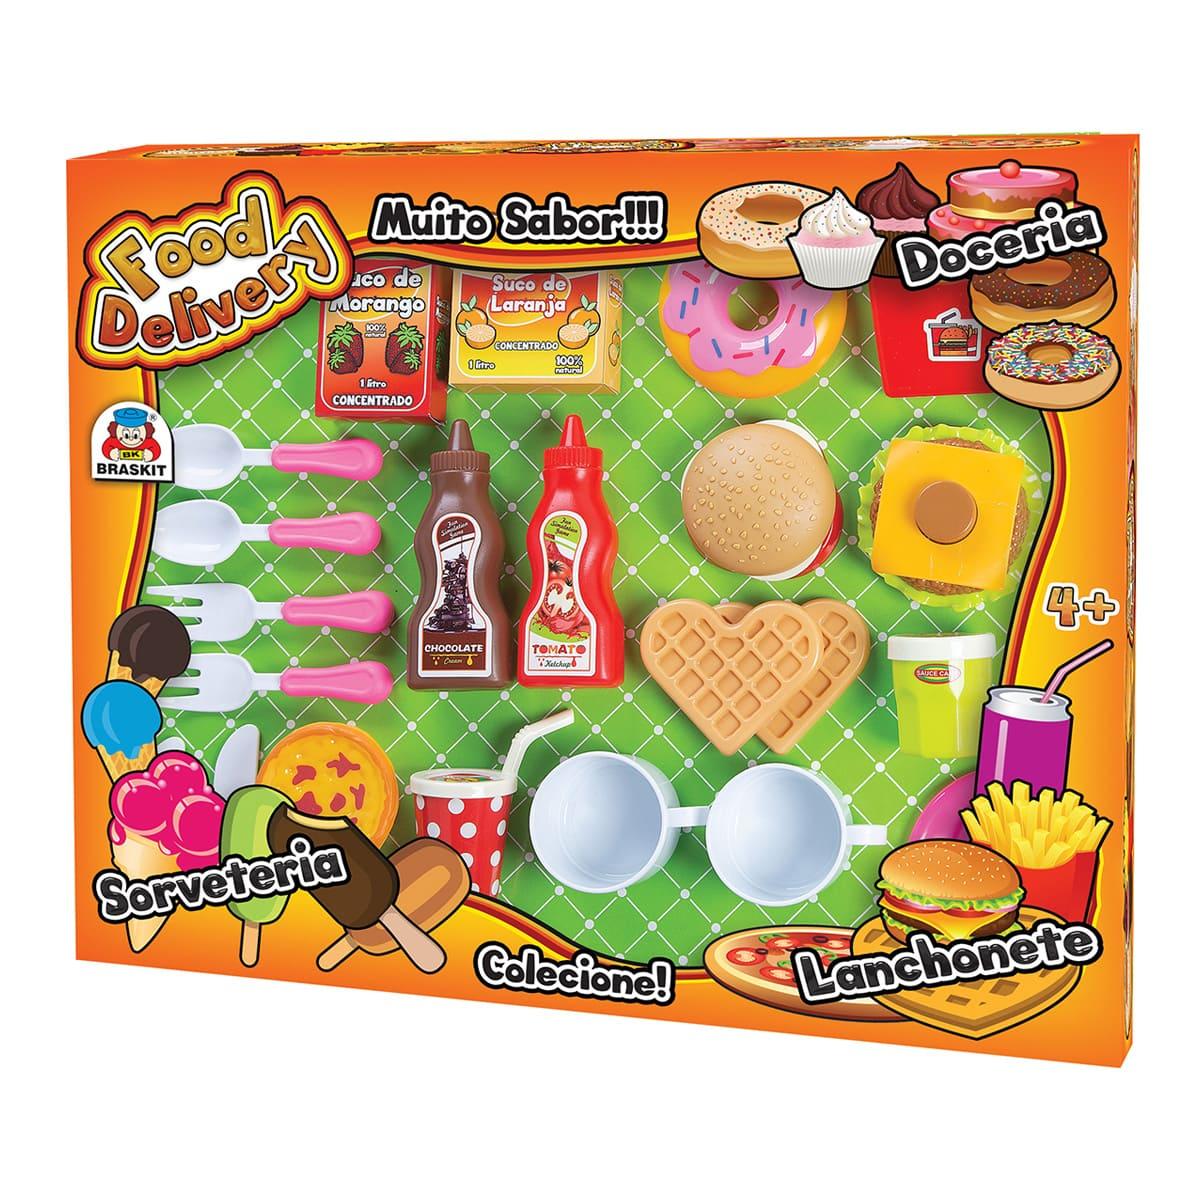 Food Delivery Lanchonete Ref.860-7 Braskit